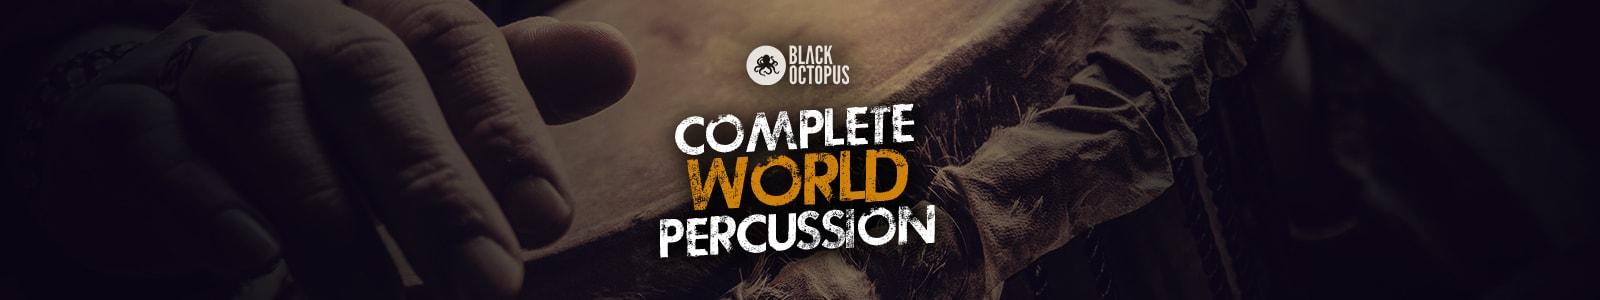 complete world percussion bundle